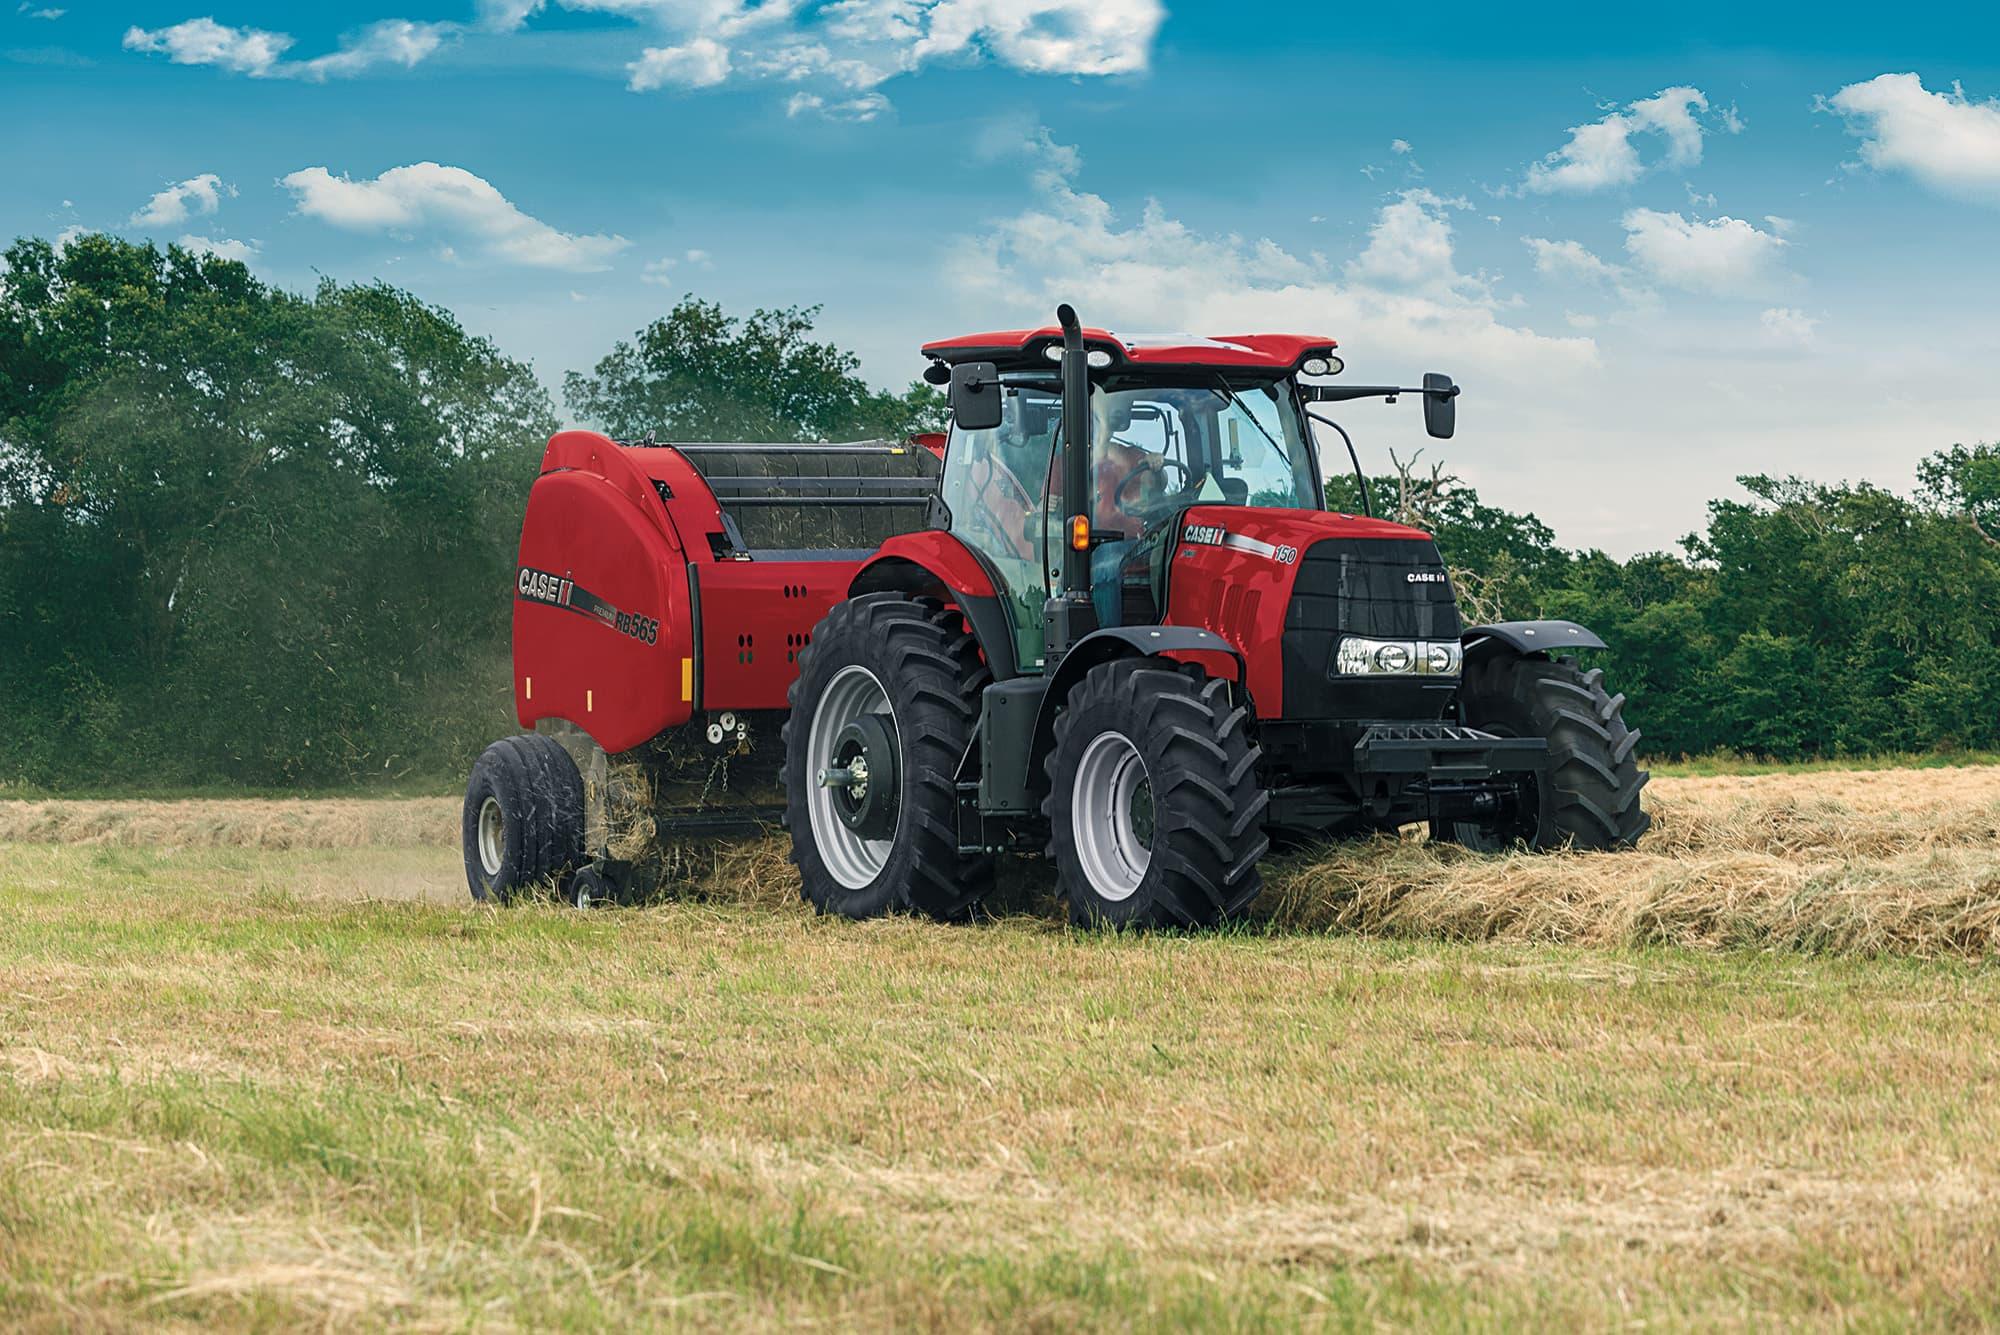 69e5393f89 Puma 150 | 4WD Row Crop Tractors | Case IH